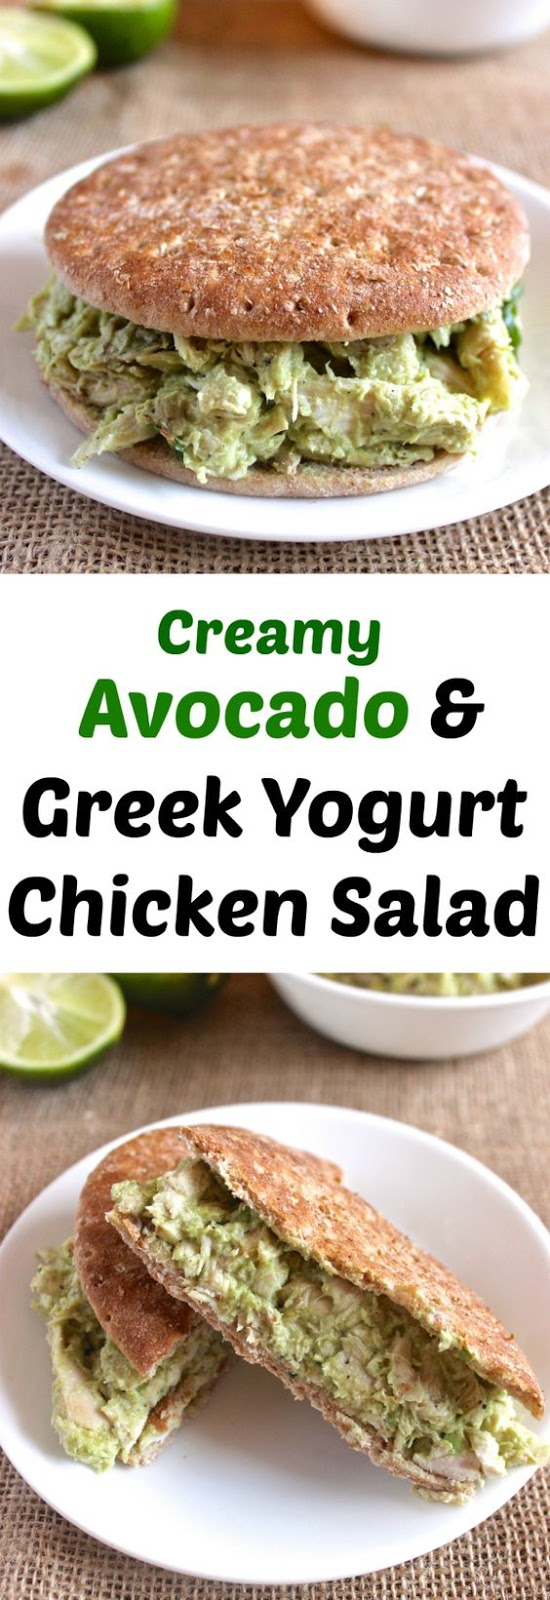 CREAMY AVOCADO GREEK YOGURT CHICKEN SALAD